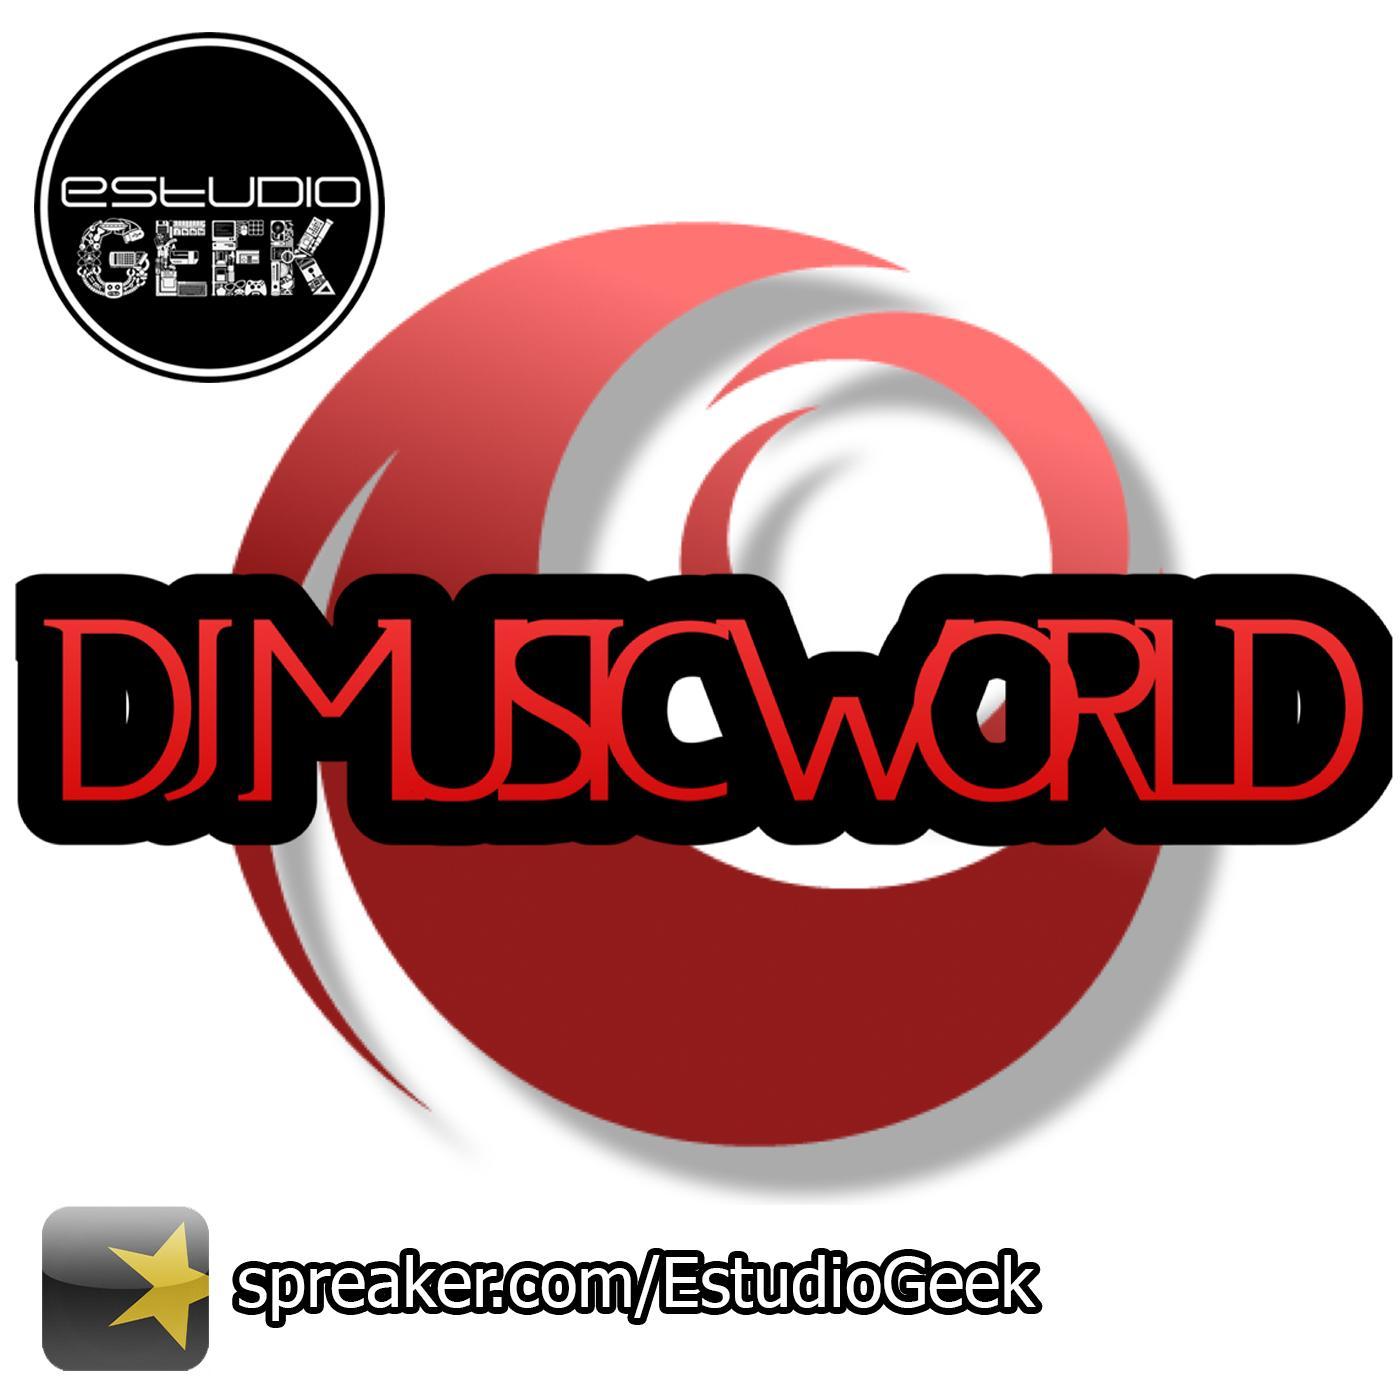 <![CDATA[DJ Music World]]>